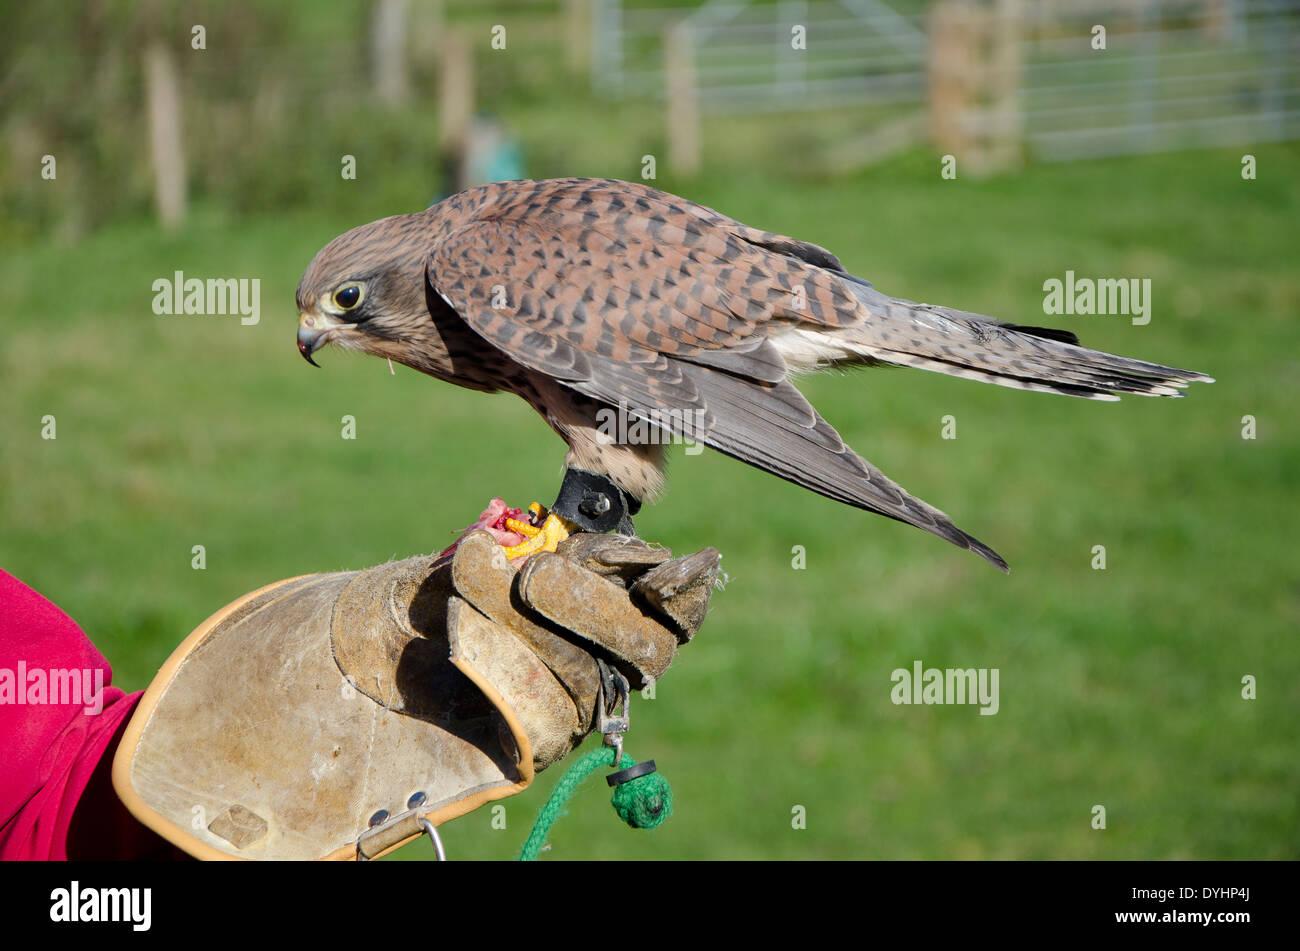 Common Kestrel at a falconry display. Falco tinnunculus - Stock Image